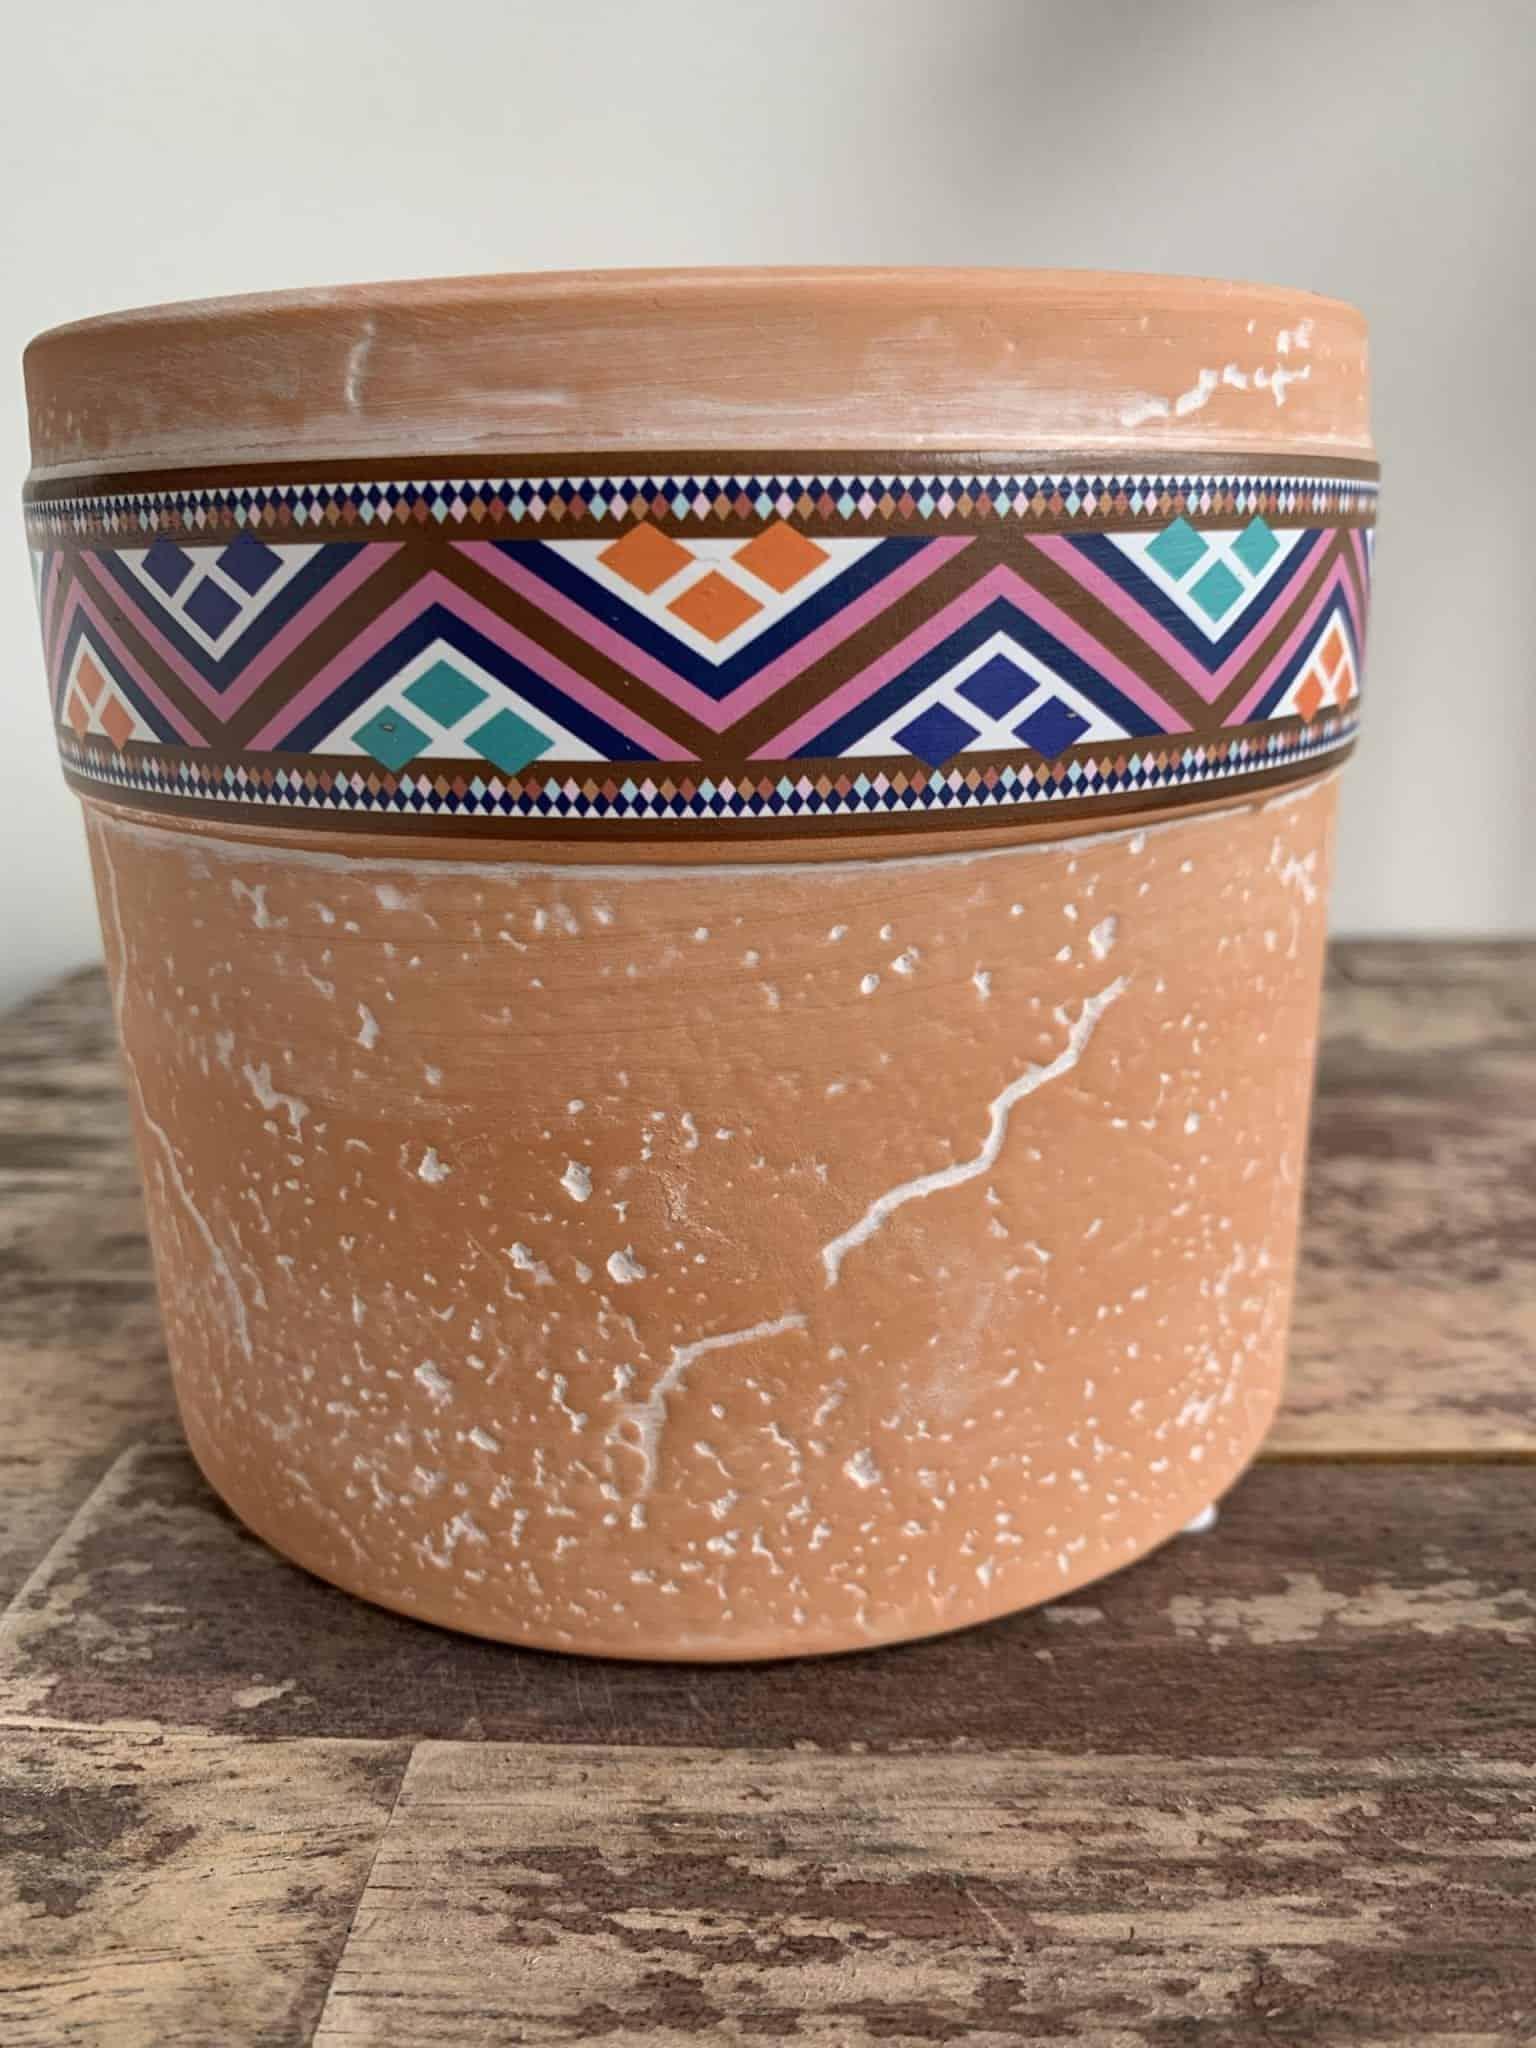 Terra Cylinder Planter for up to 12cm Pots - Zig Zag